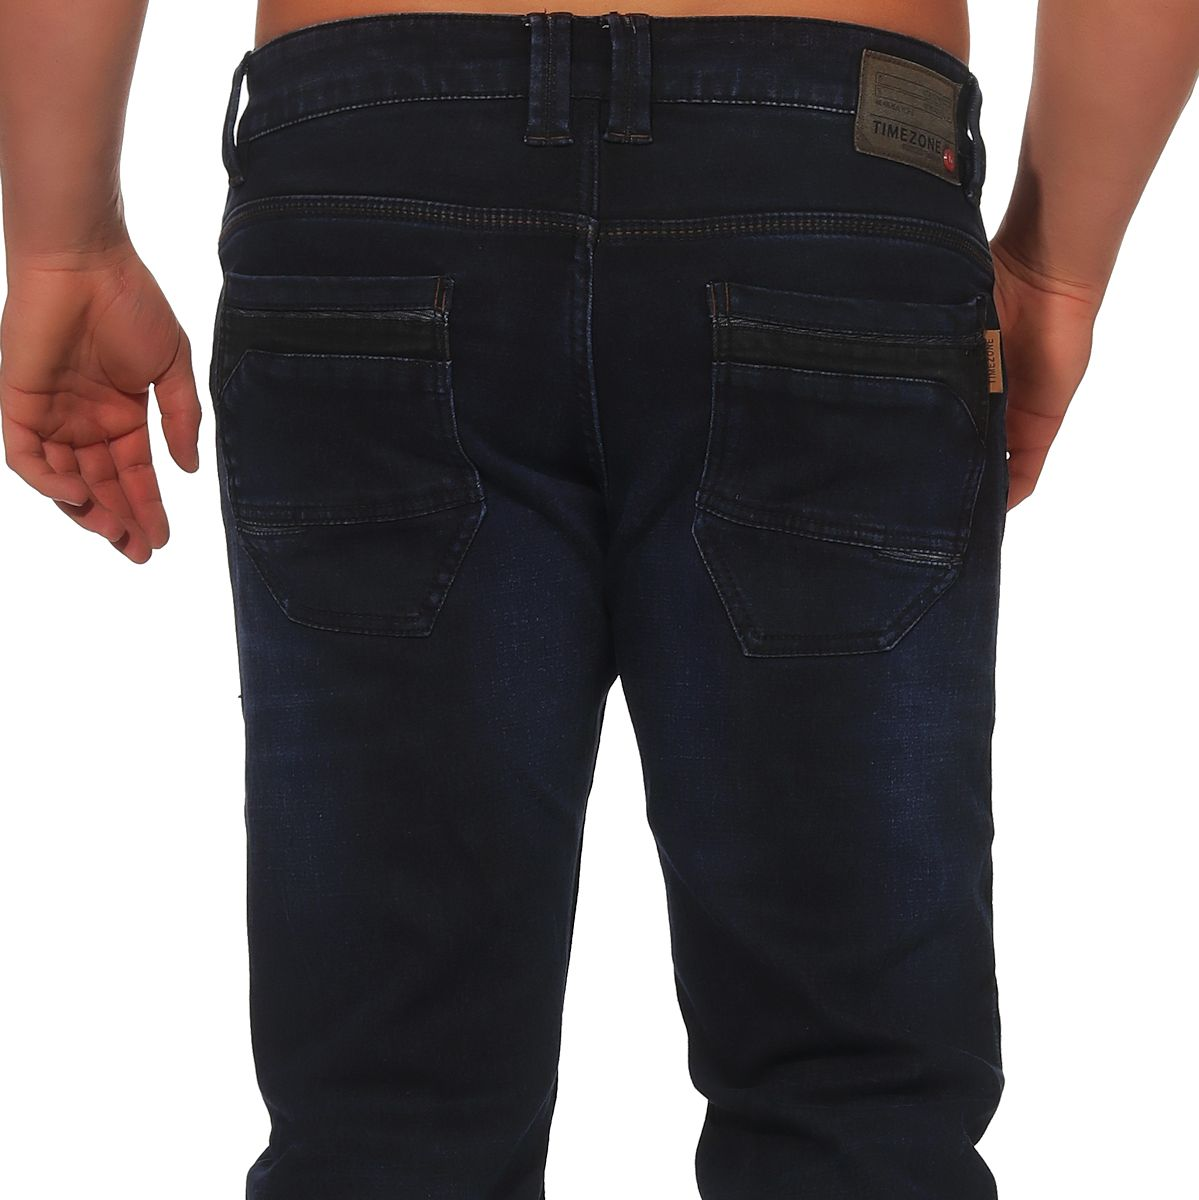 Timezone Herren Jeans Hose Herrenhose Jeanshose Denim Slim Ryan blue black wash